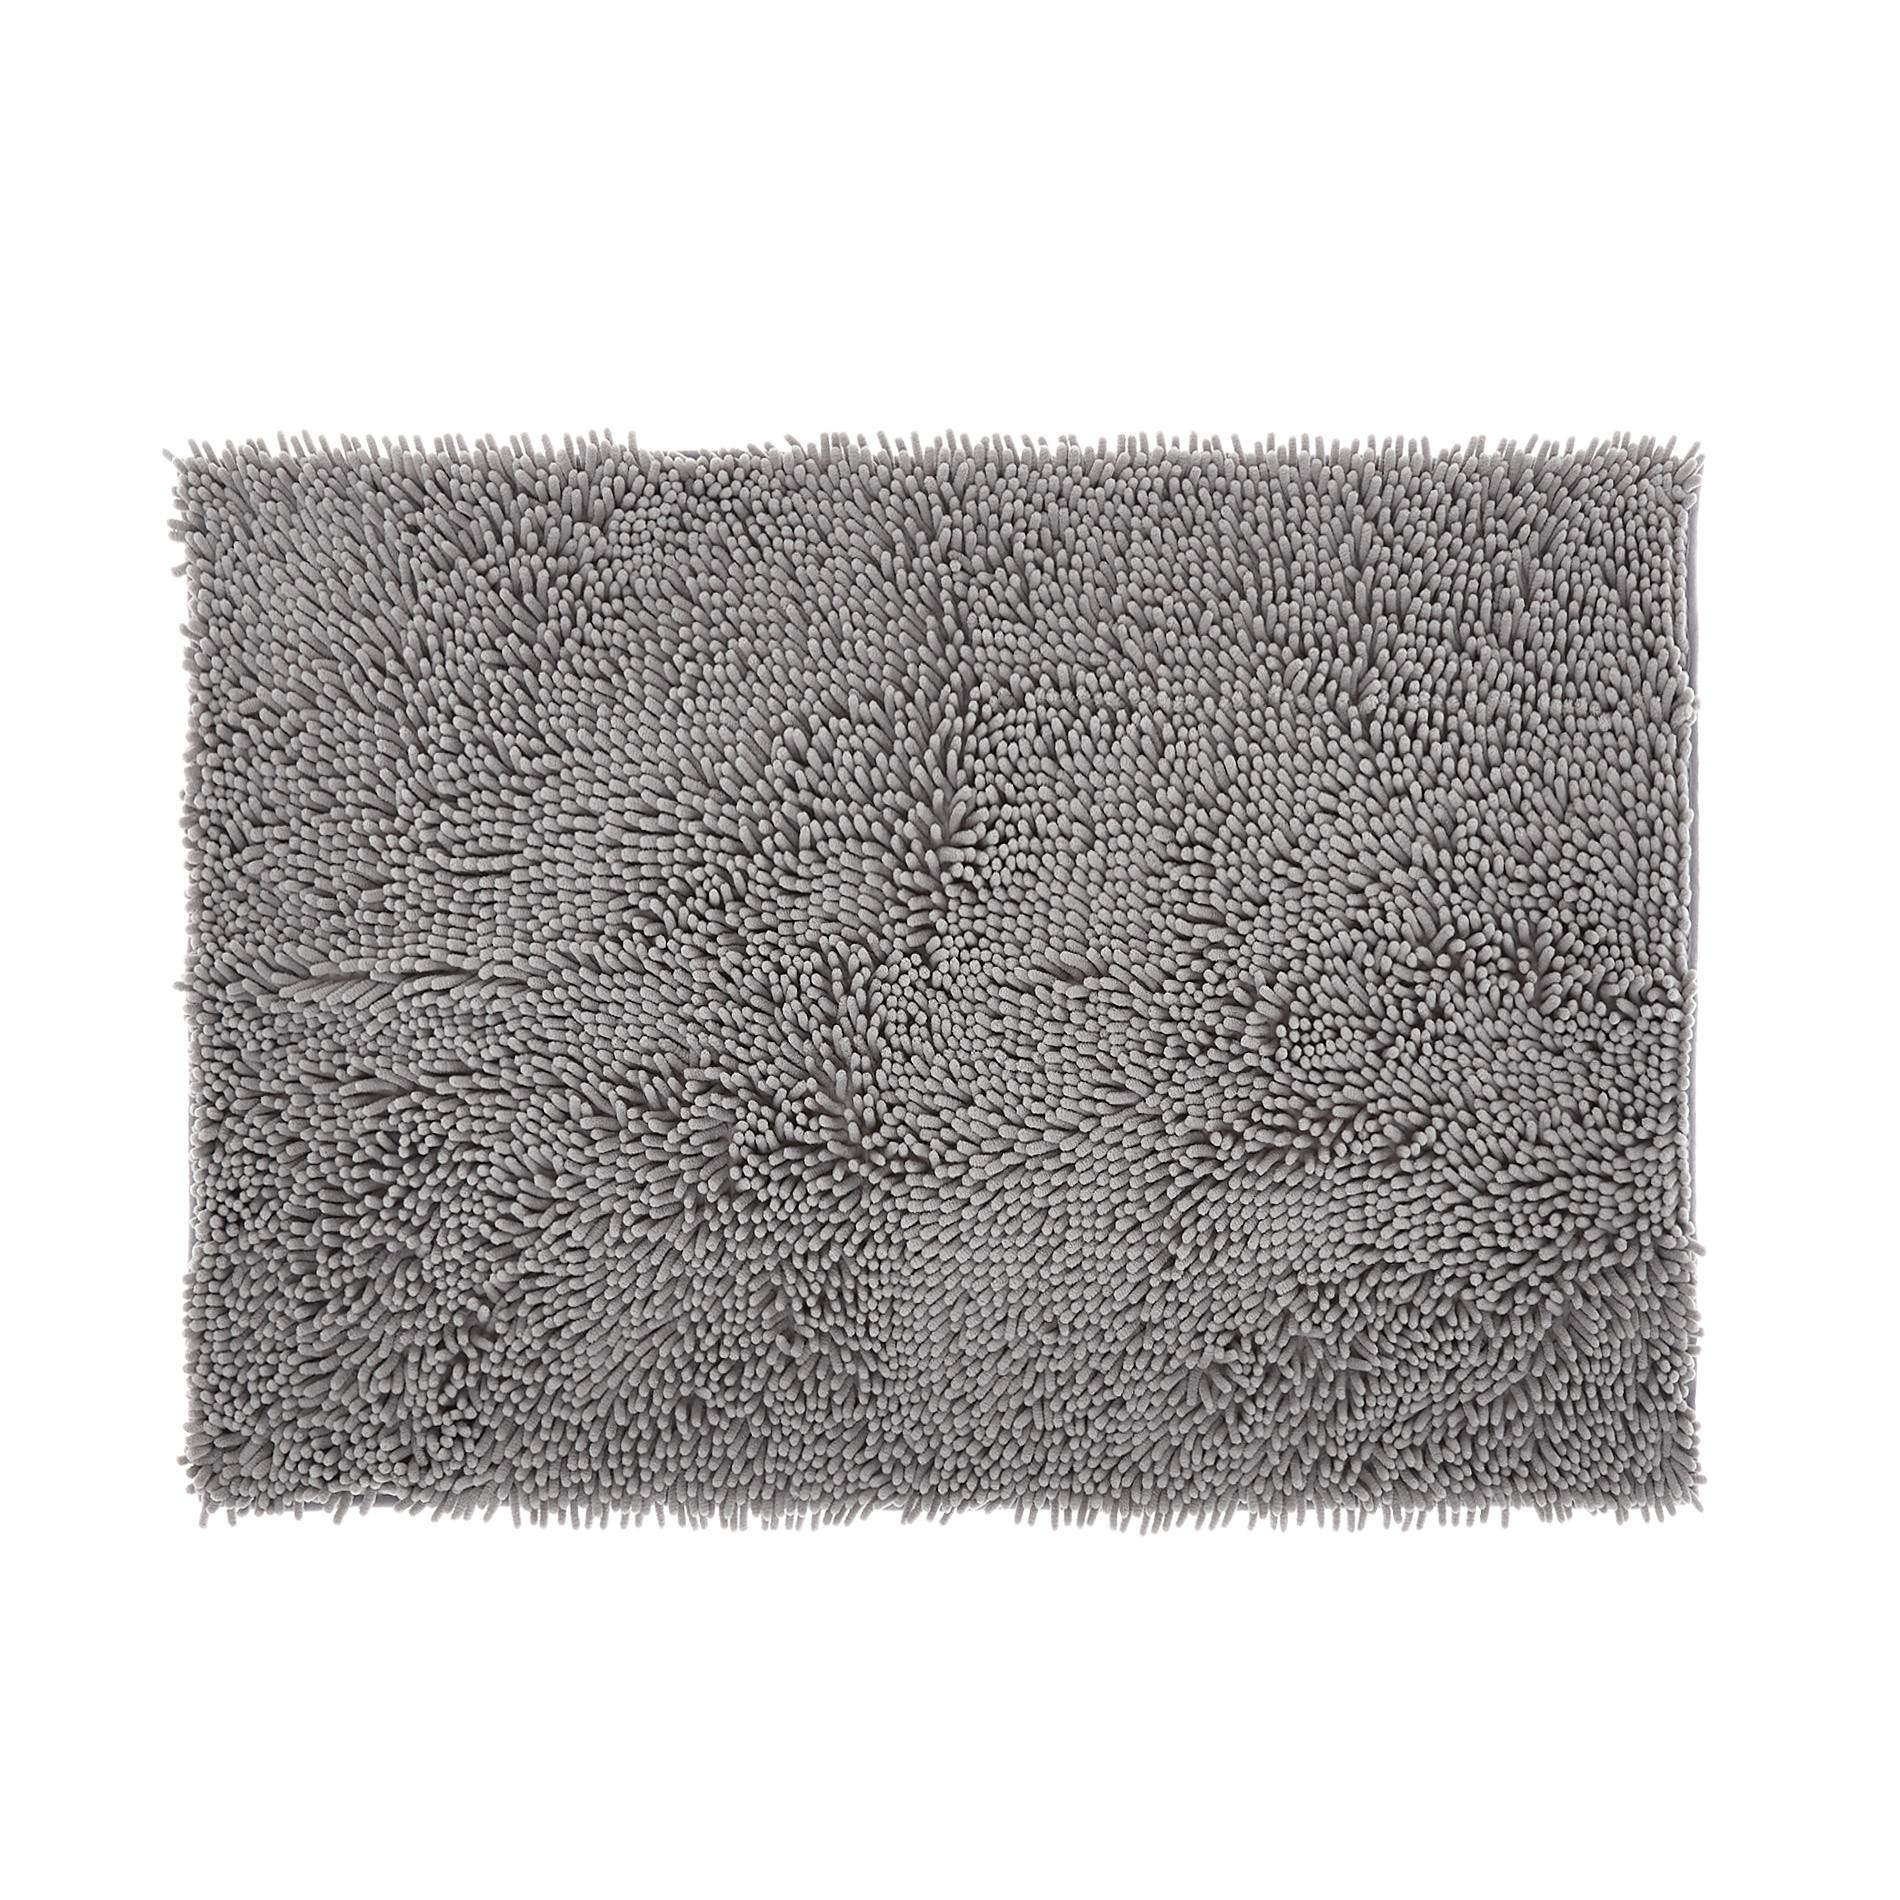 Tappeto bagno microfibra shaggy, Grigio, large image number 0